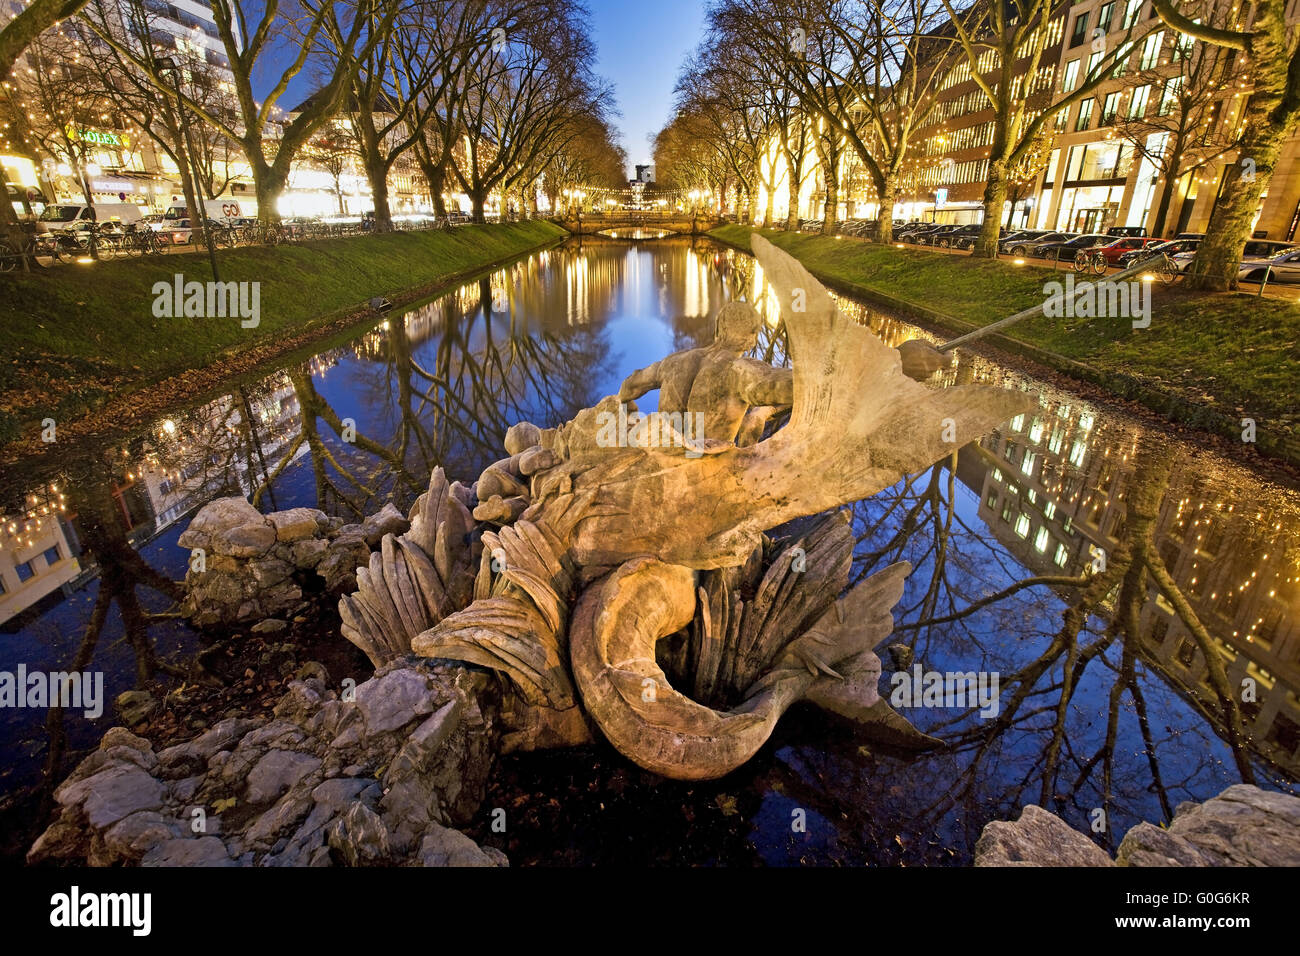 The Triton Fountain at the Koenigsallee, Duesseldorf, North Rhein Westphalia, Germany, Europe Stock Photo